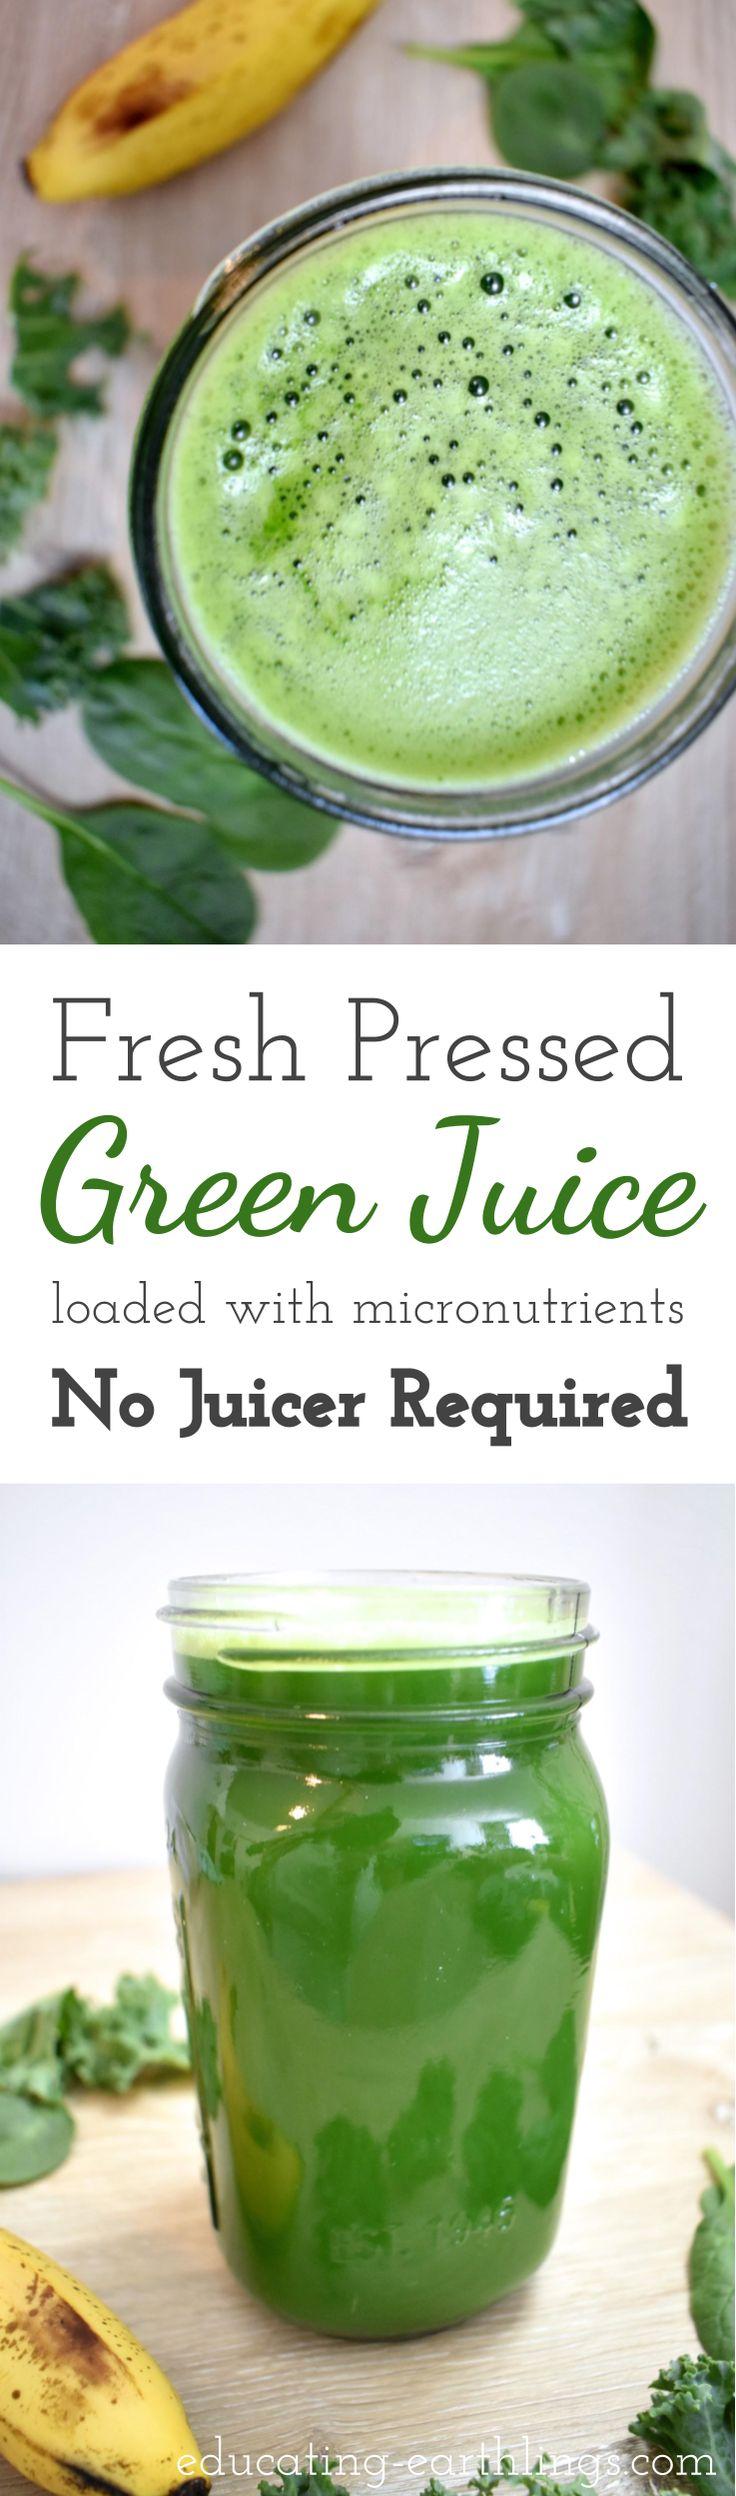 Fresh Pressed Green Juice - No Juicer Required - homemade green juice - juicing - juice cleanse - healthy drinks - vegan recipes